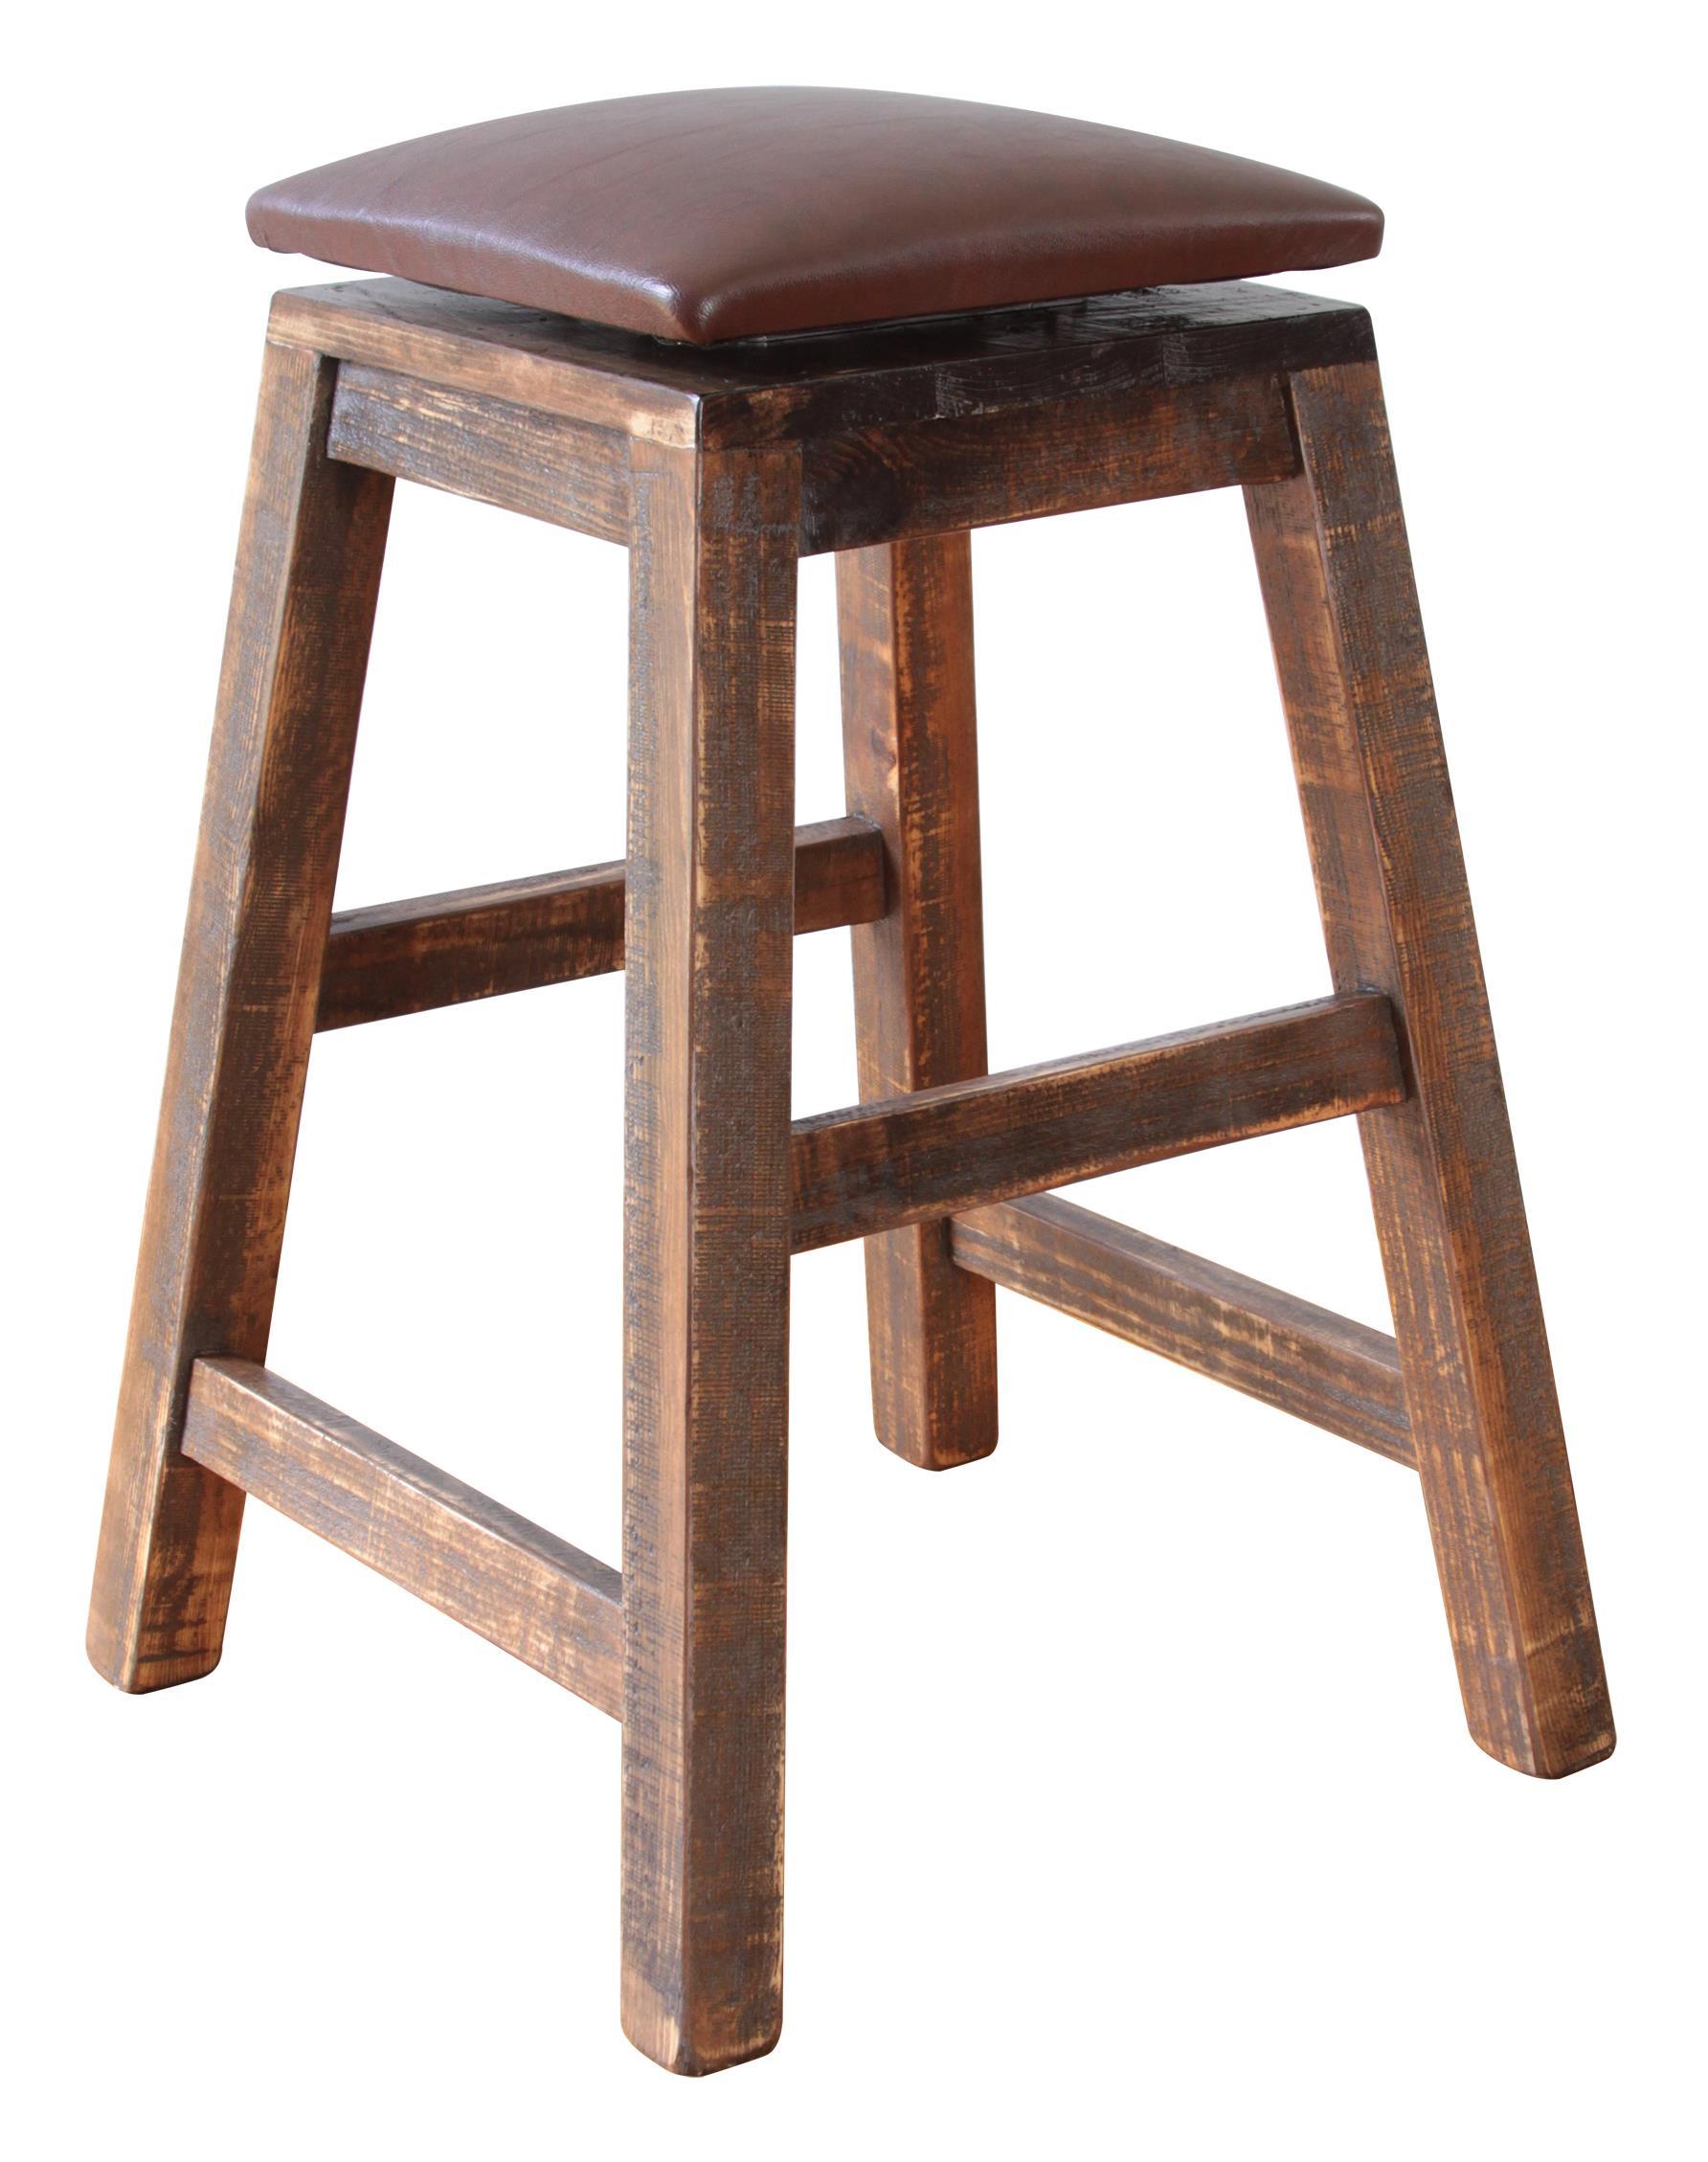 International furniture direct 900 antique ifd967stool 24 for Furniture direct